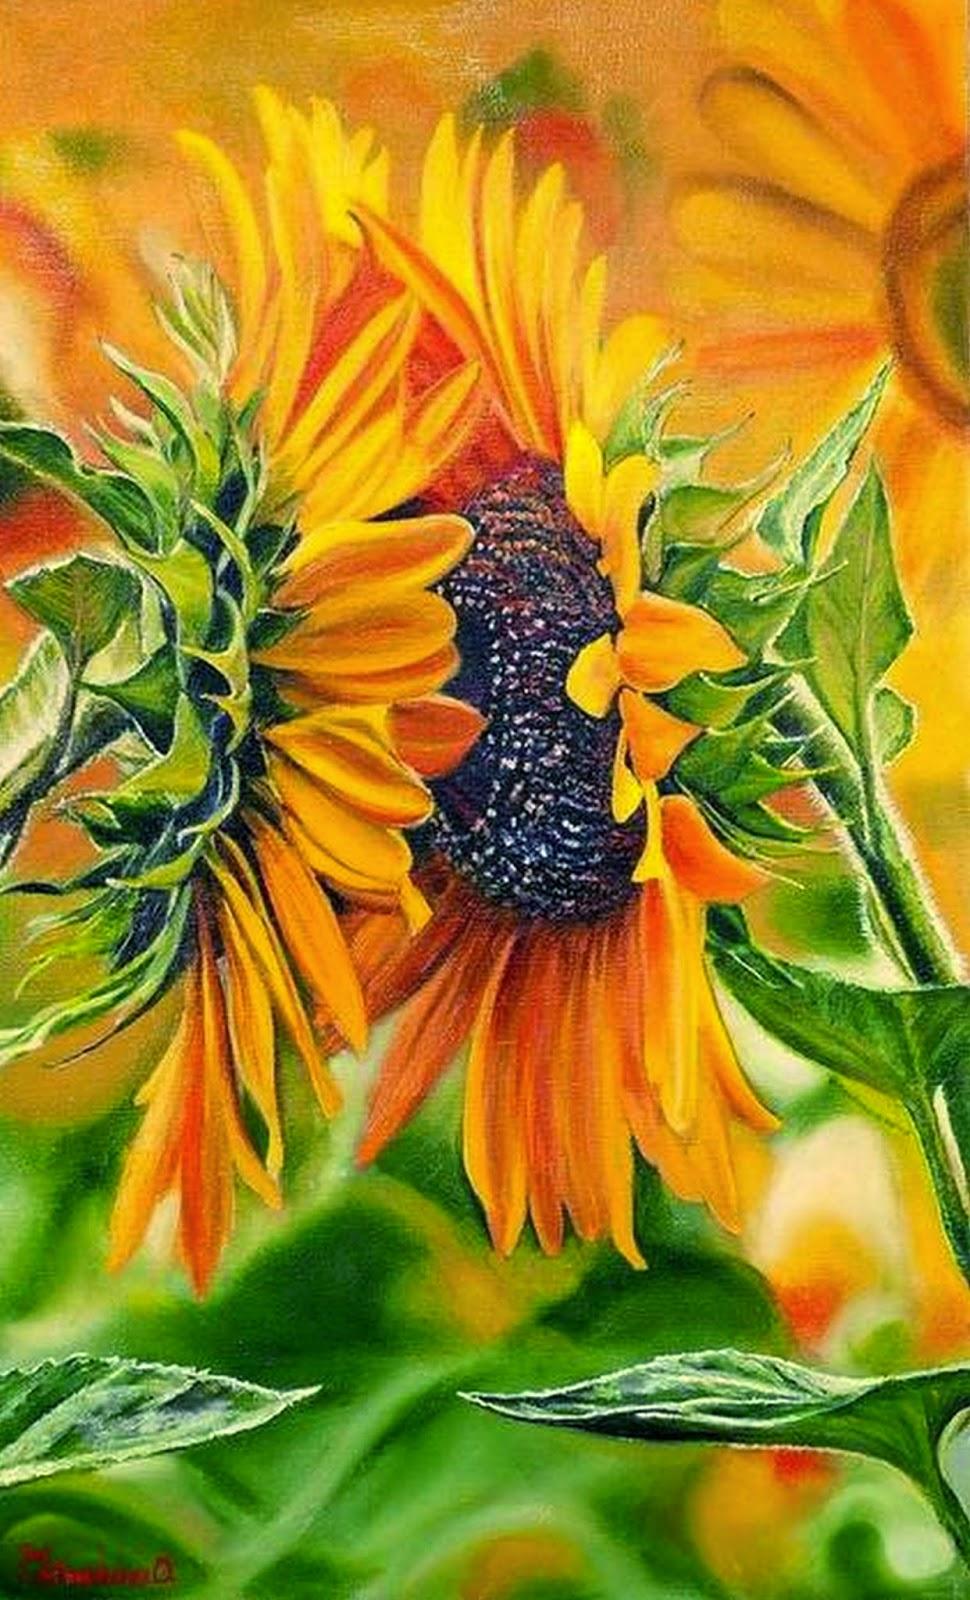 Im genes arte pinturas ideas para pintar cuadros de for Ideas para pintar cuadros